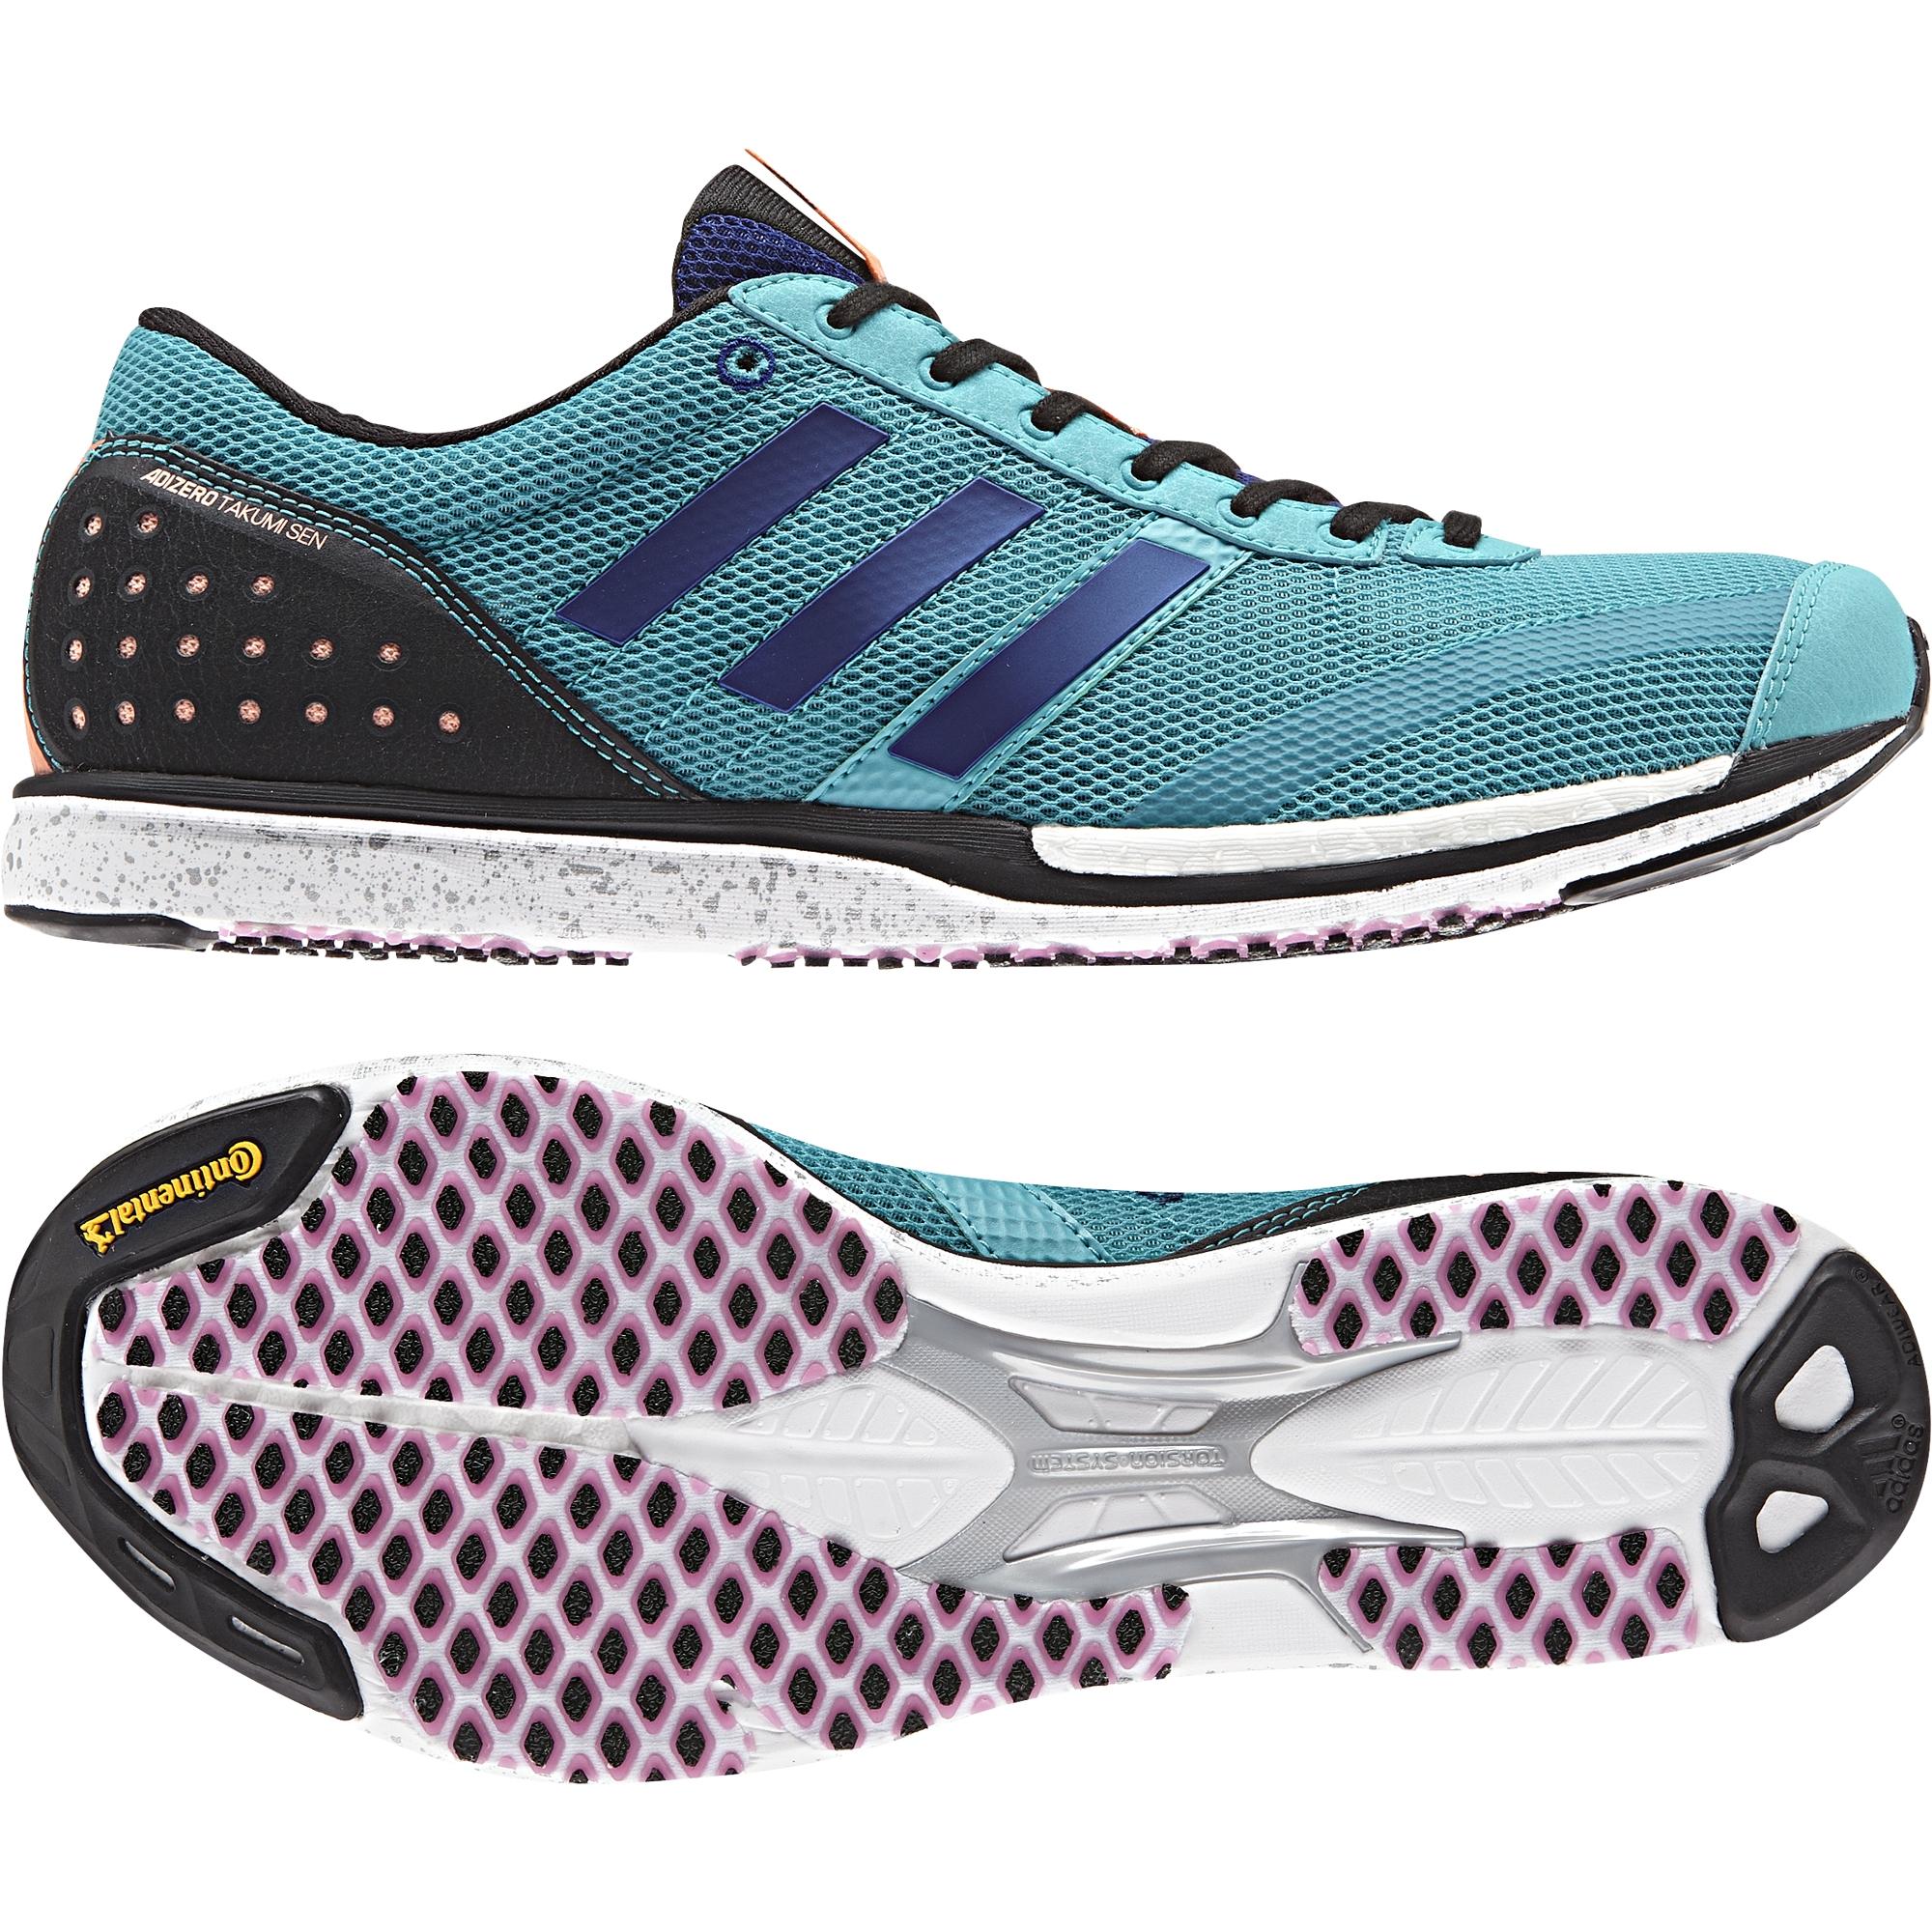 Adizero 3 Takumi Ren Chaussures Adidas qzUMVpSG